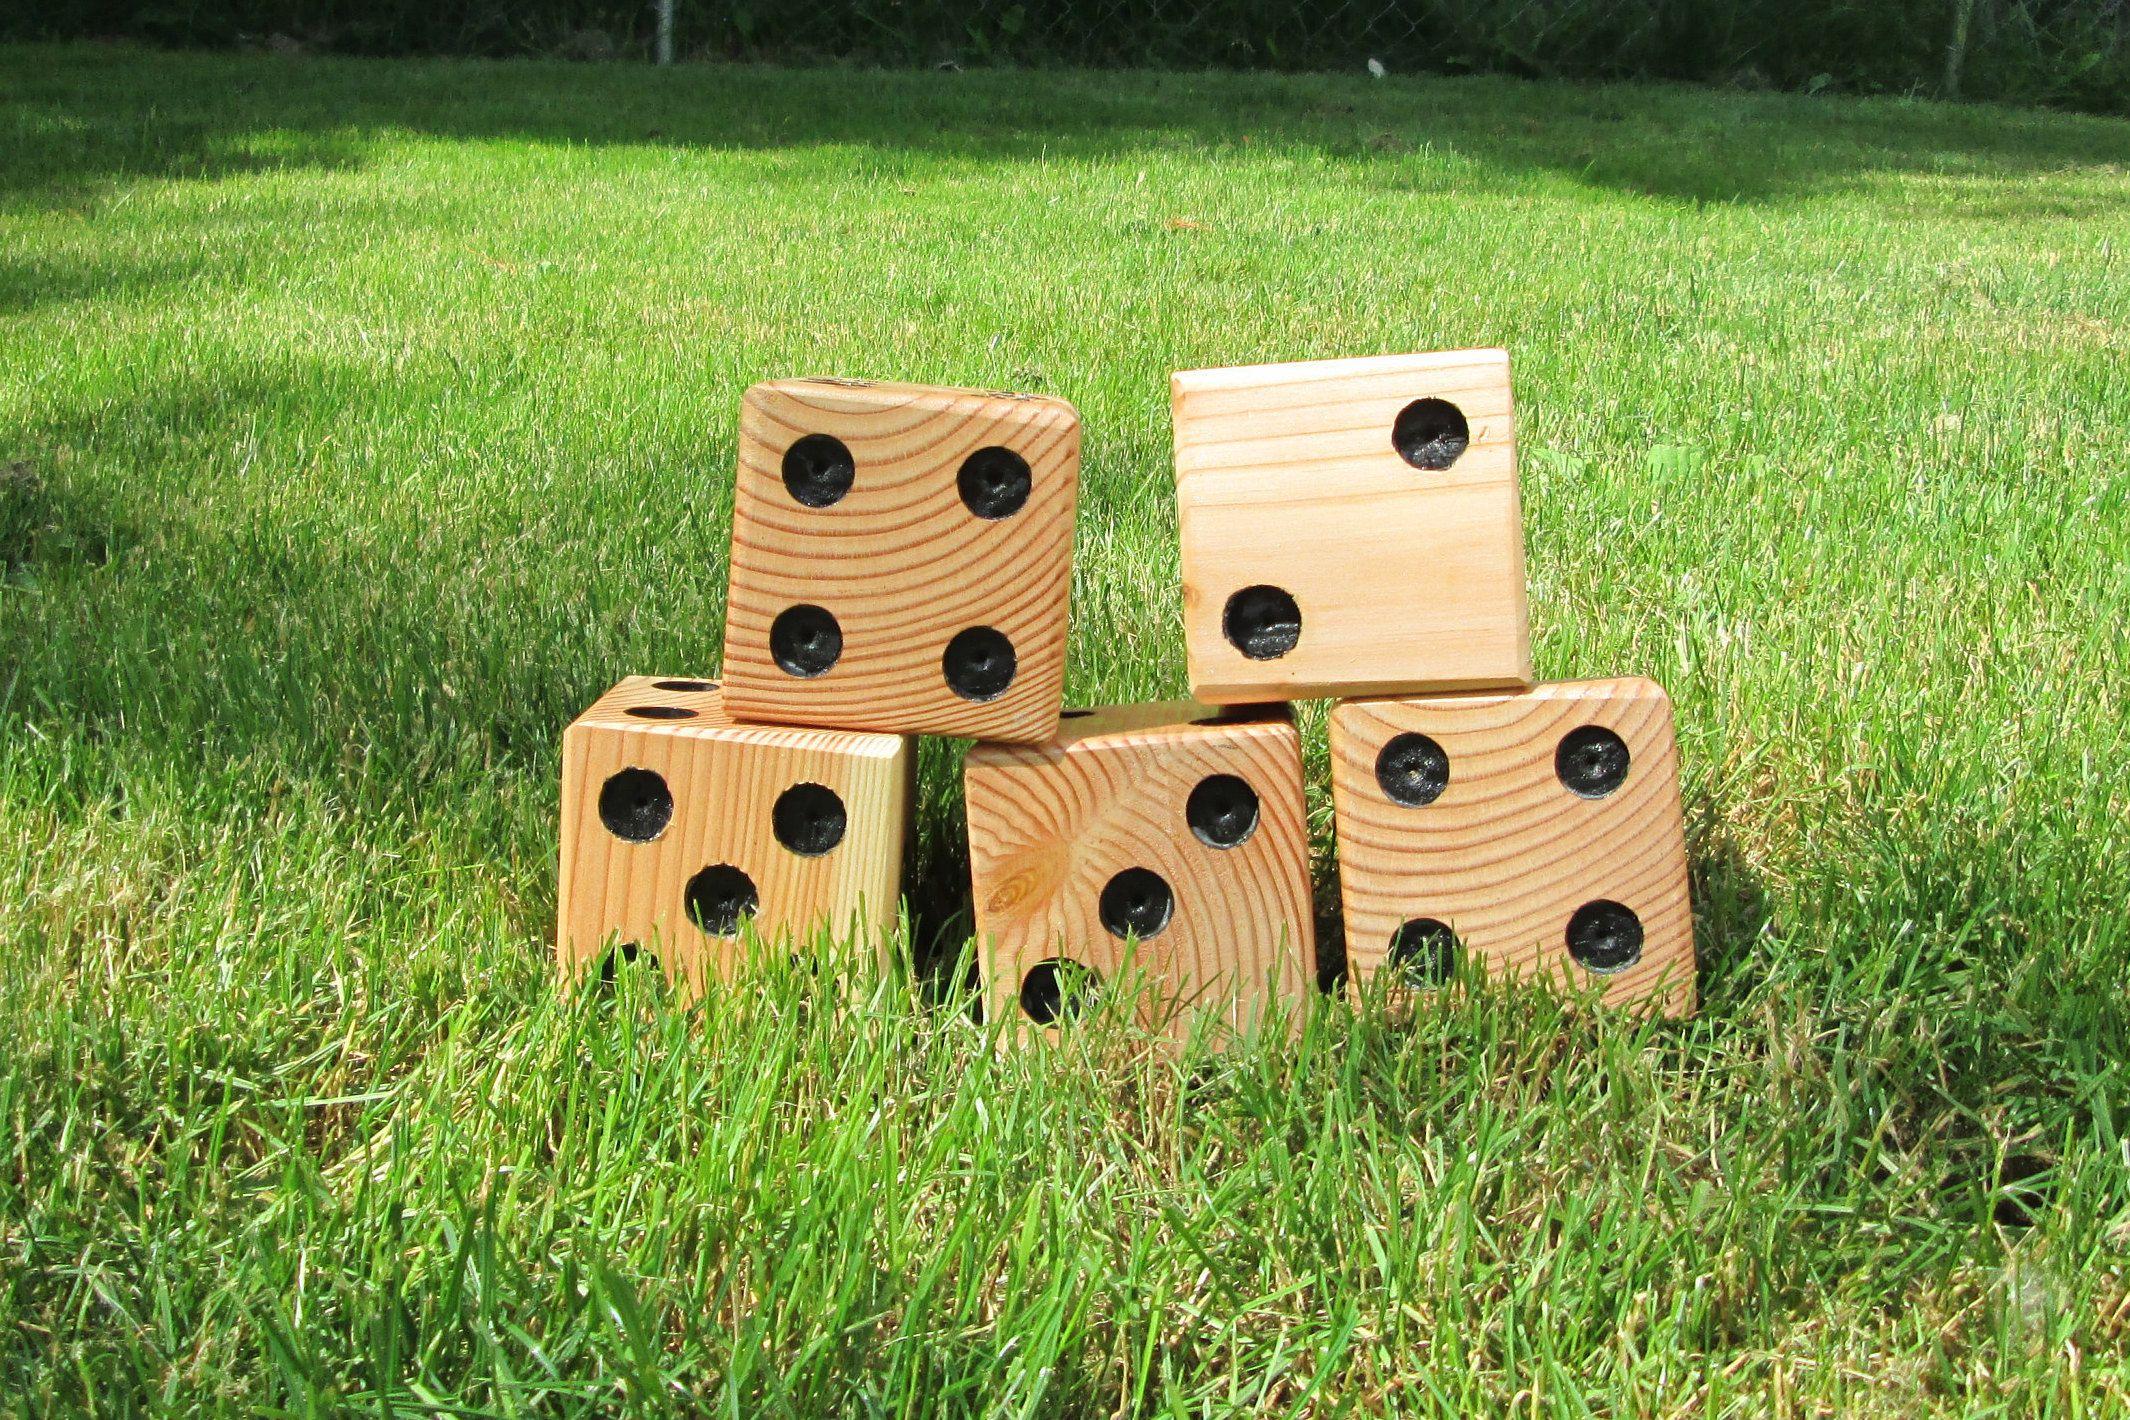 Games For Kids Wood Giant Yahtzee Yard Yahtzee Yard Dice Family